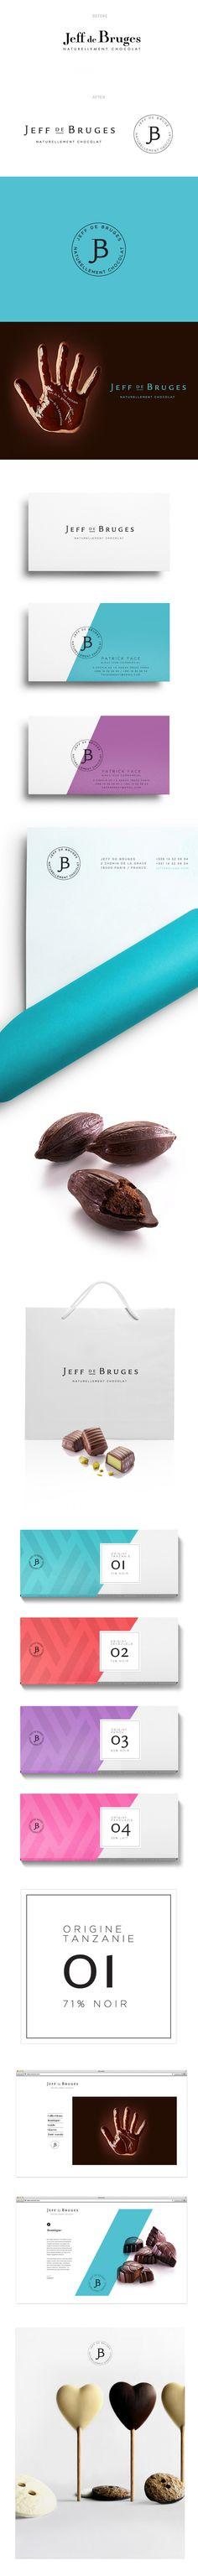 jeff de bruges rebrand by THEBAULT JULIEN, via Behance. Mmmm #chocolate #packaging #branding PD